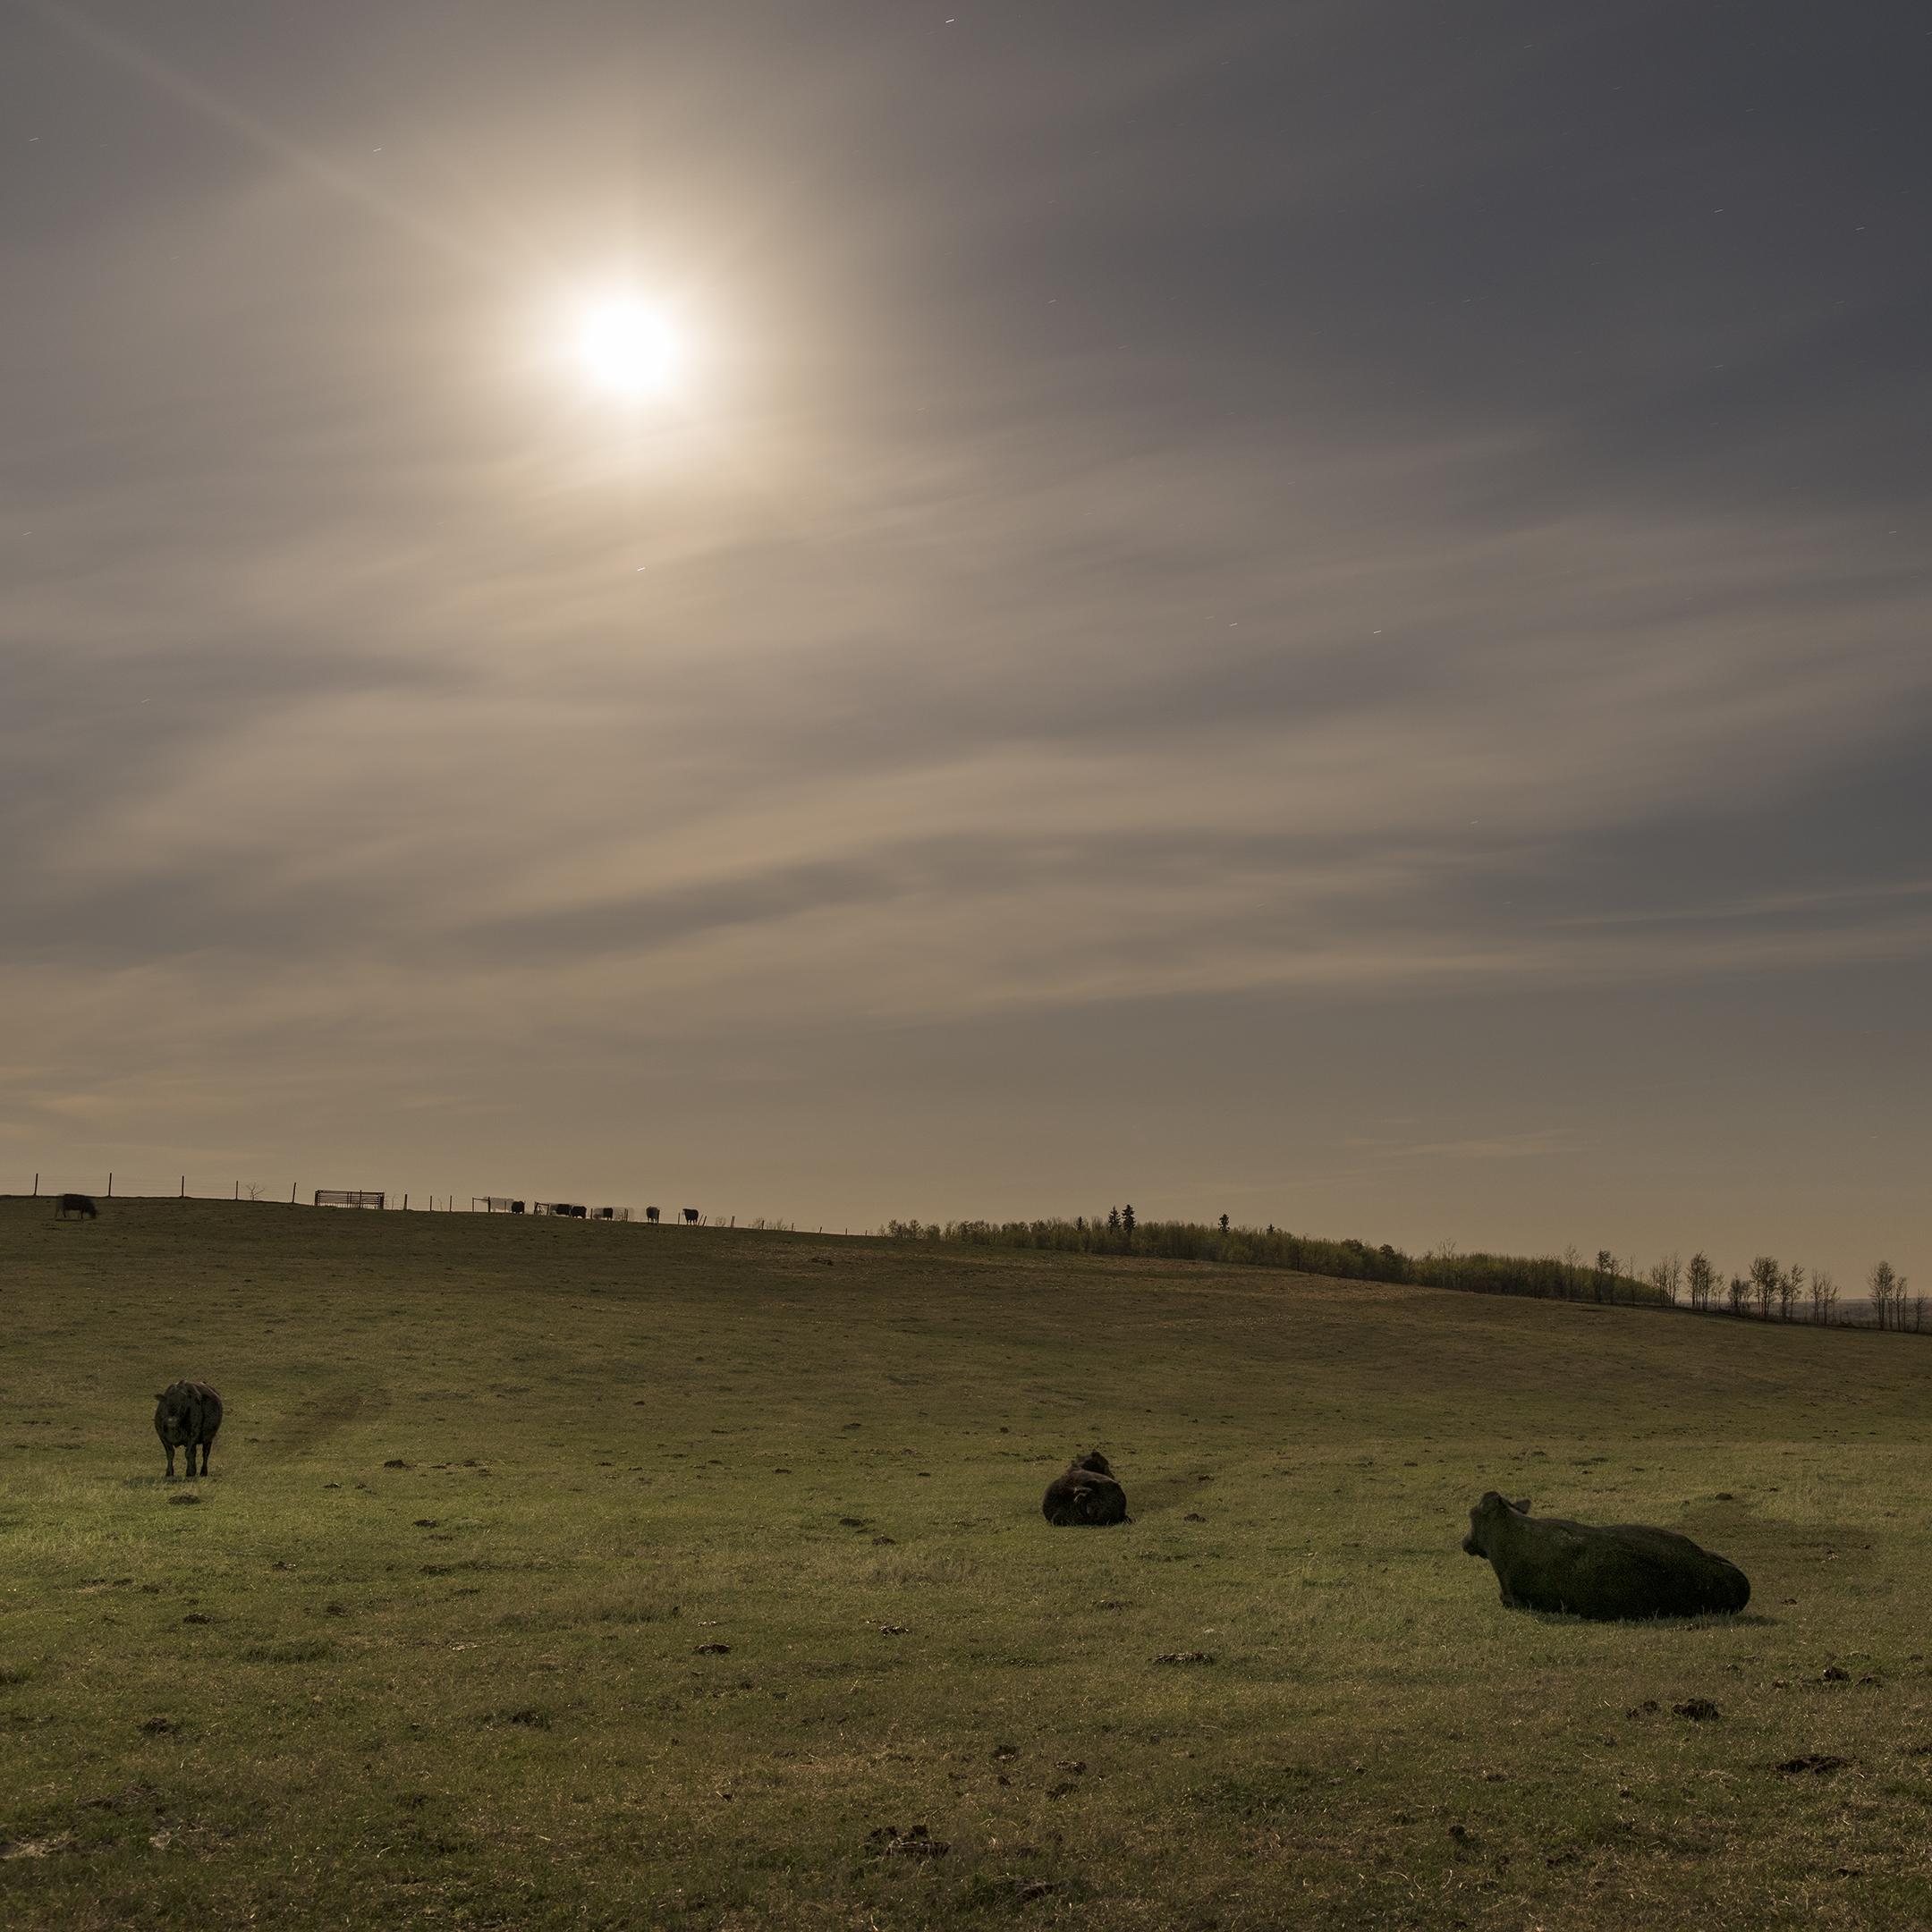 Calving Cows Under Moonlight (2016)